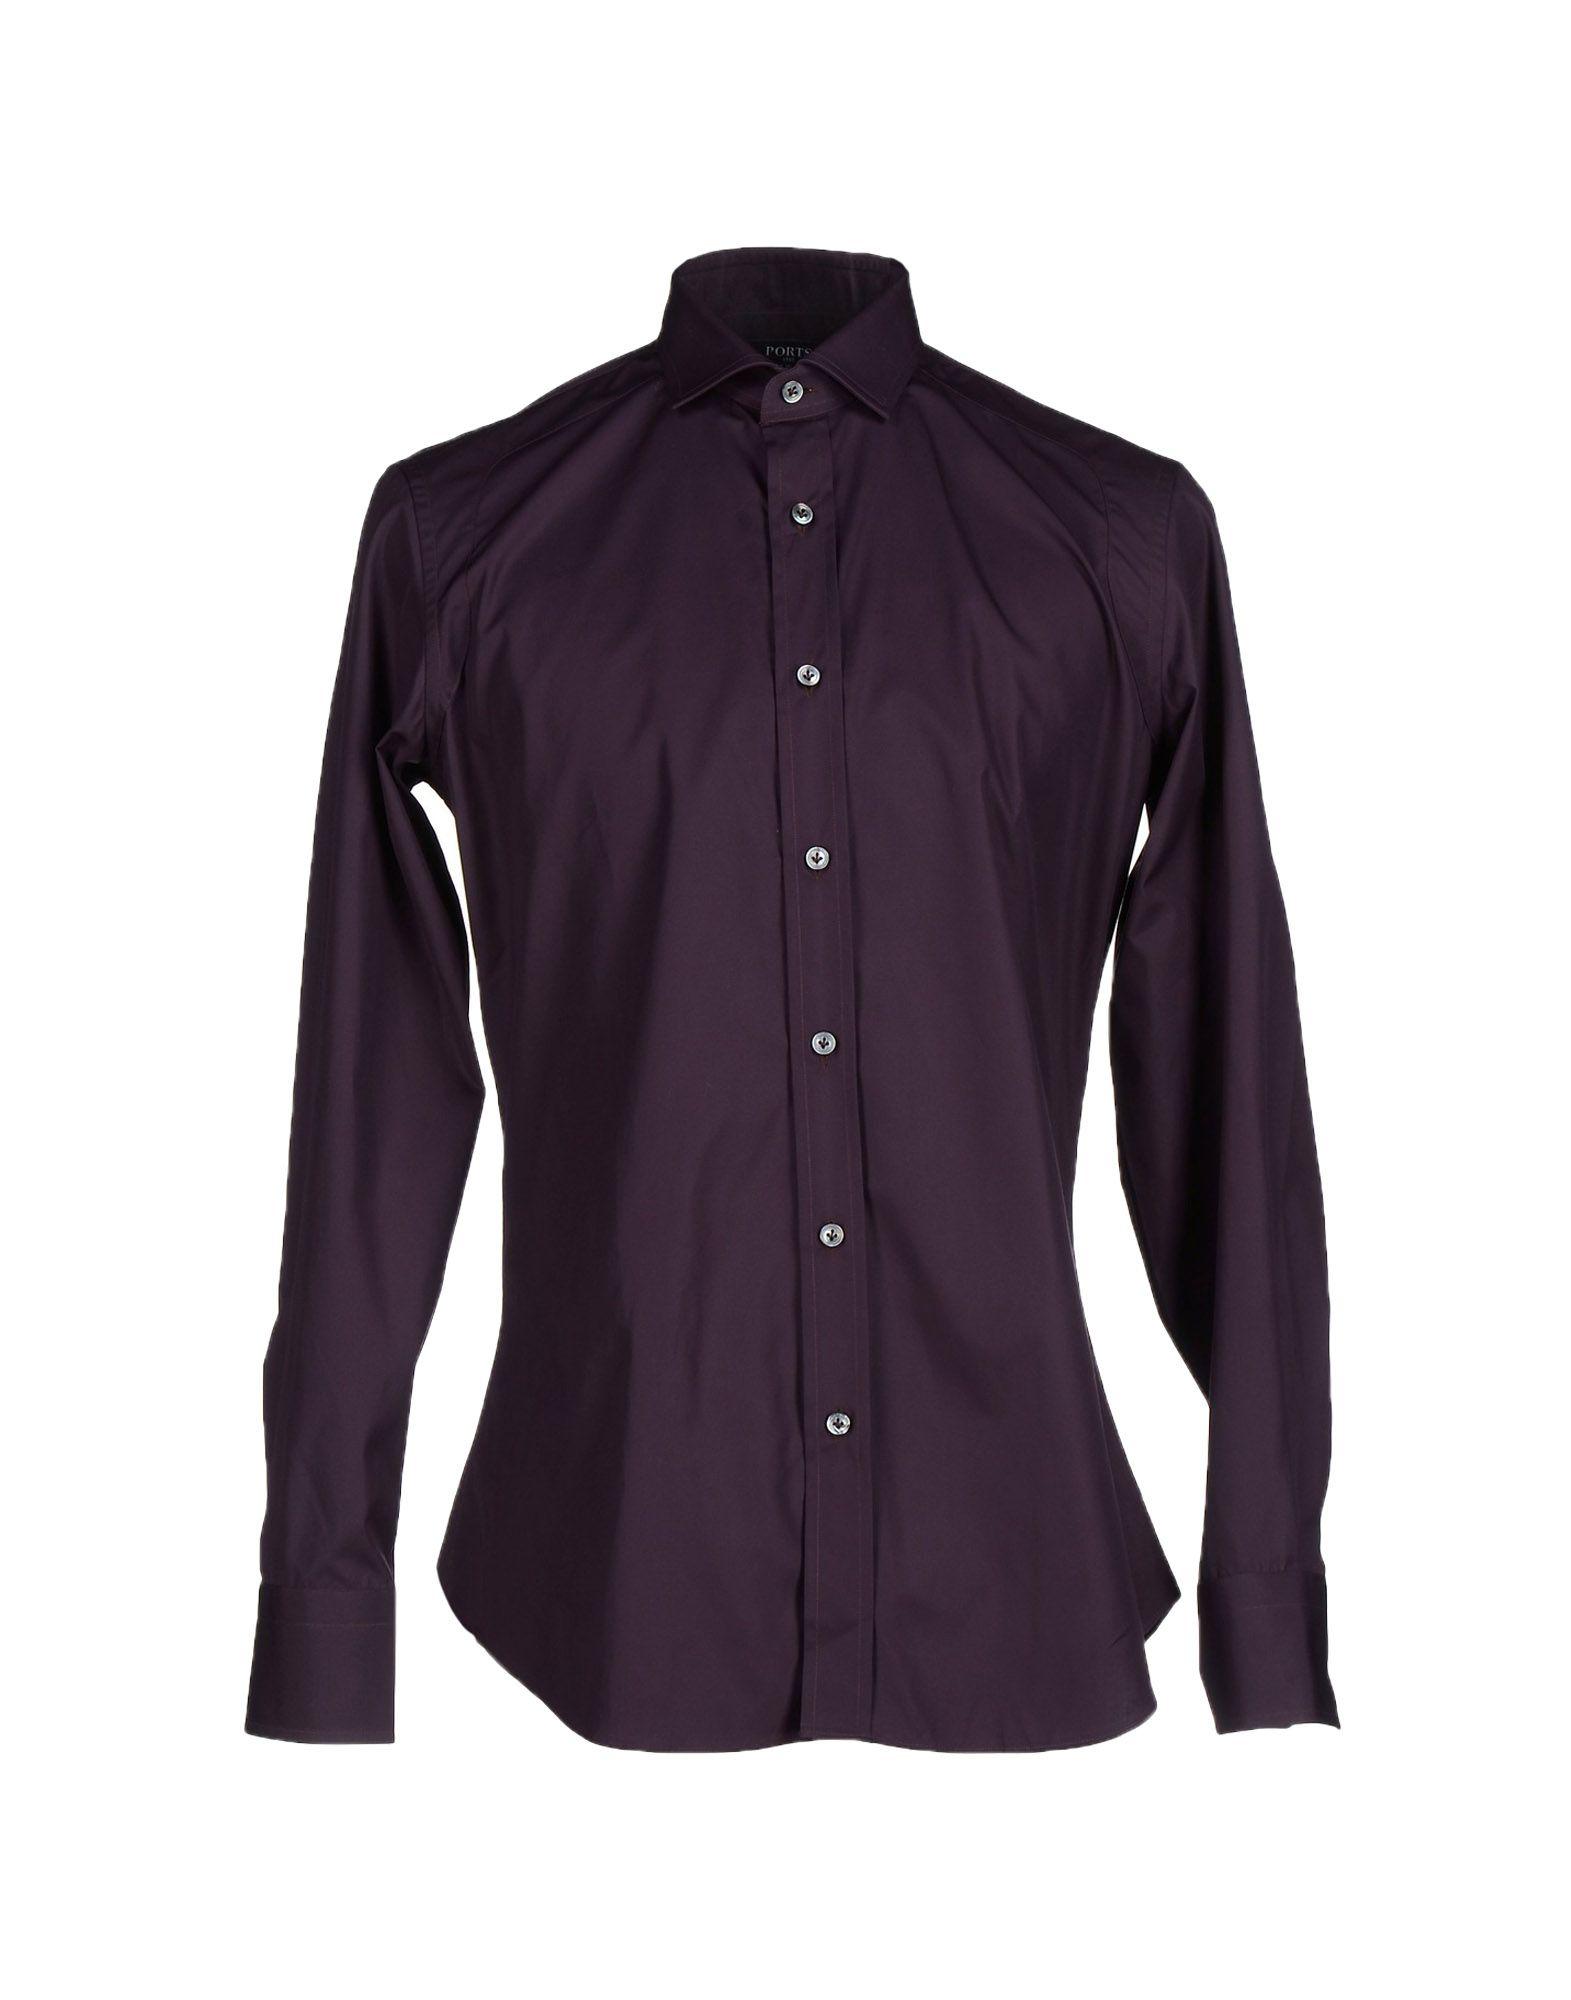 Ports 1961 Shirt in Purple for Men (Dark purple) - Save 50 ...